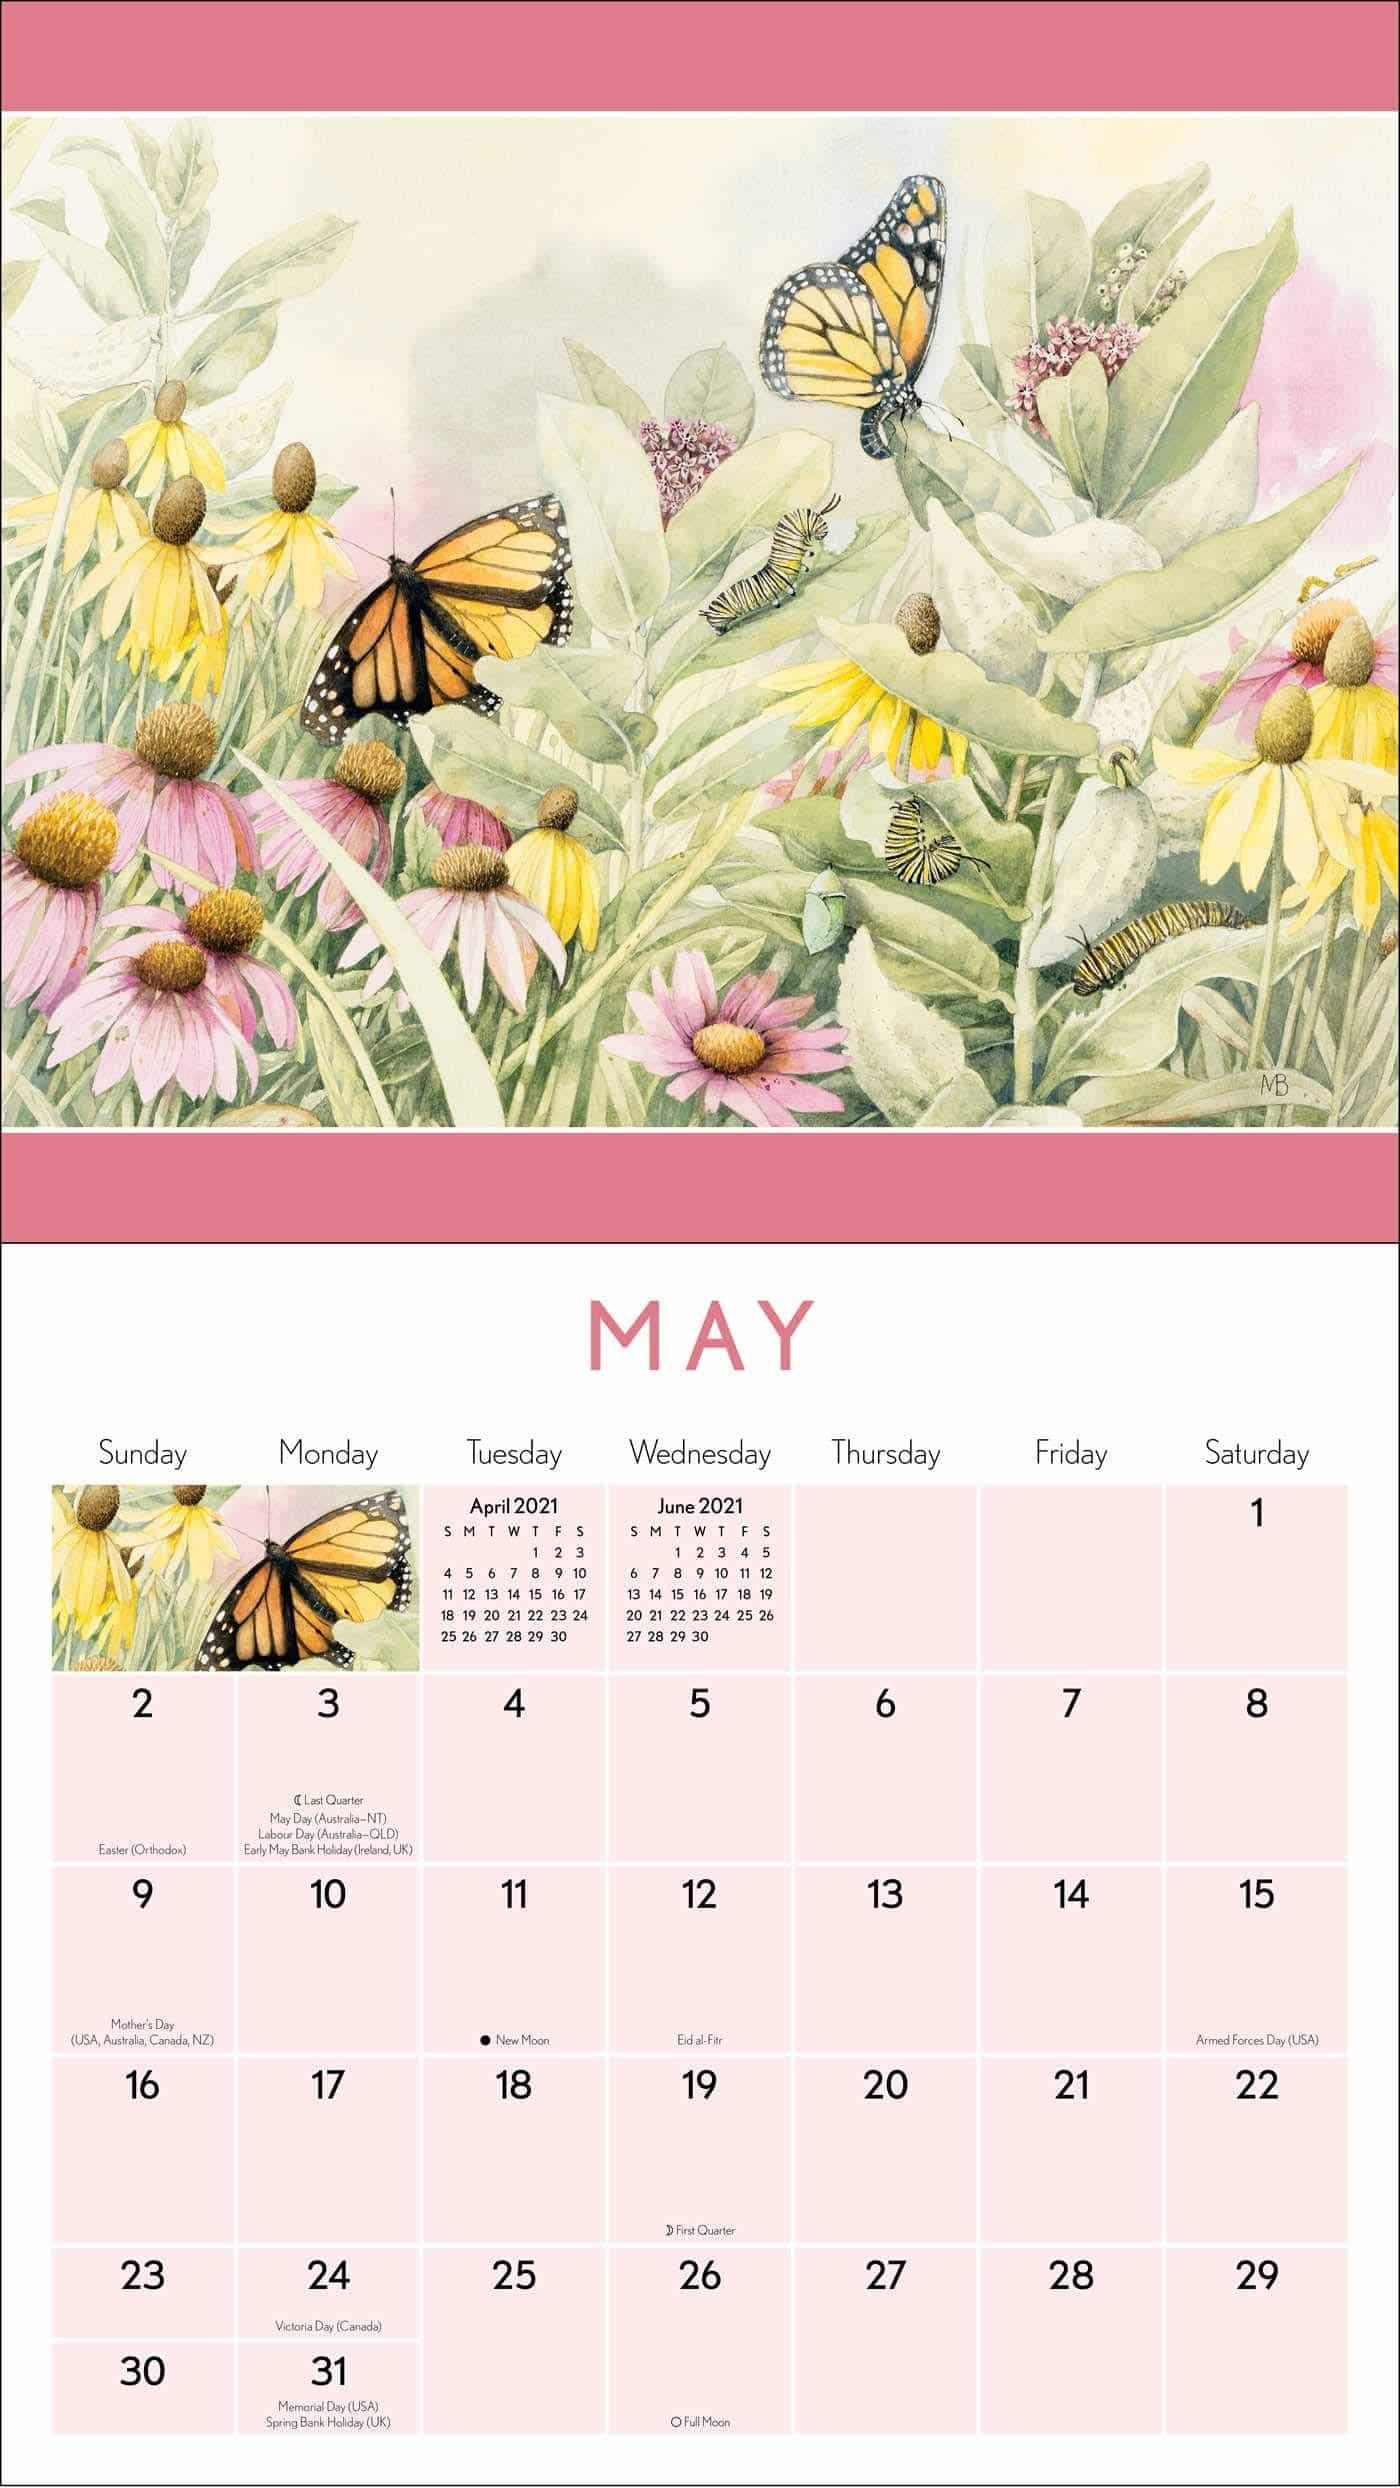 Marjolein Bastin - calendrier pour Grand-mère